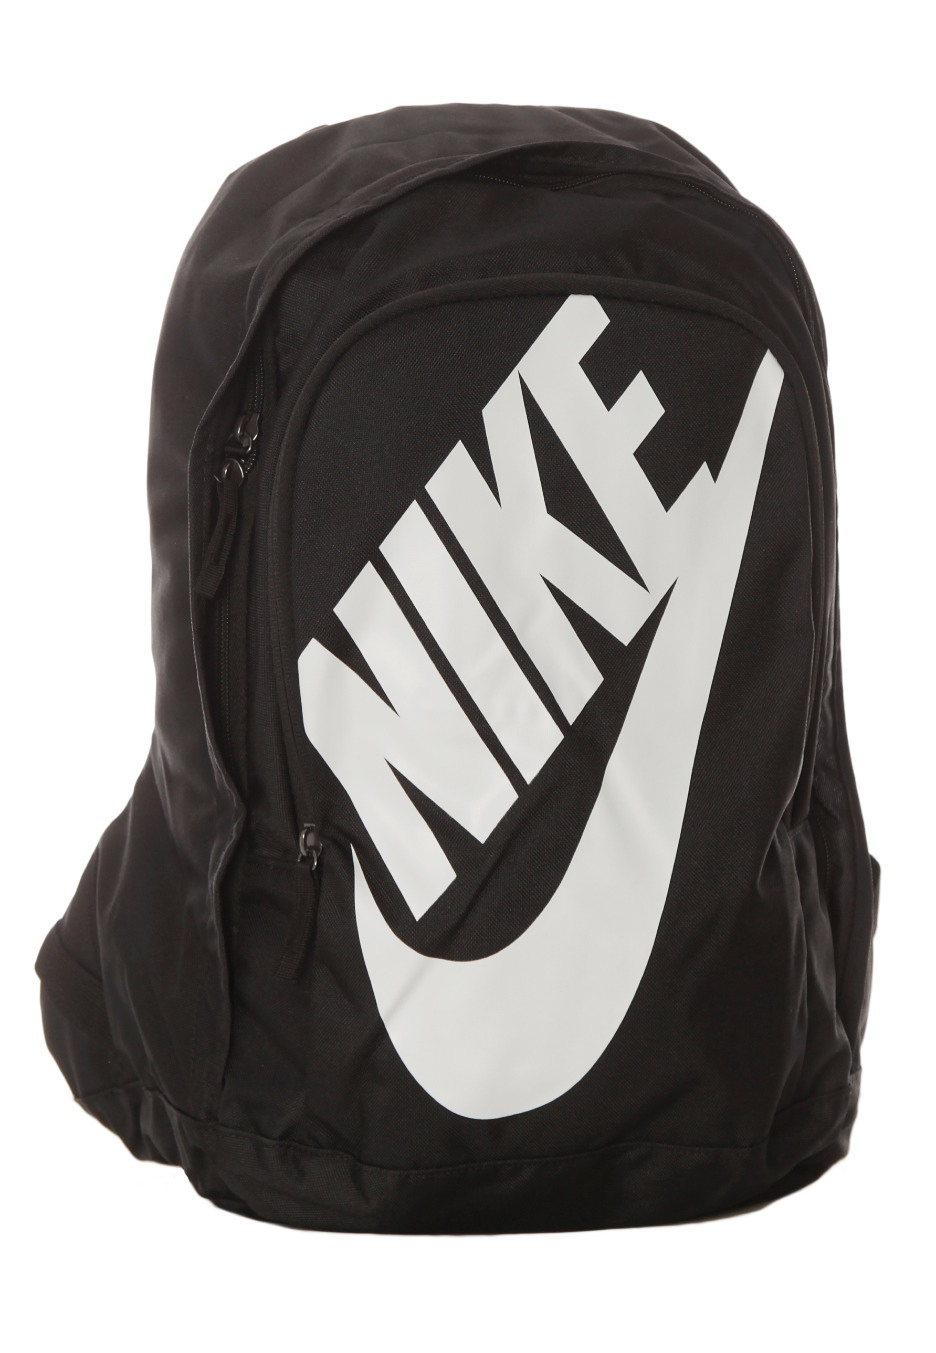 Nike - Hayward 2.0 Medium Black Black White - Backpack - Streetwear Shop -  Impericon.com UK bfbaf1fee25b